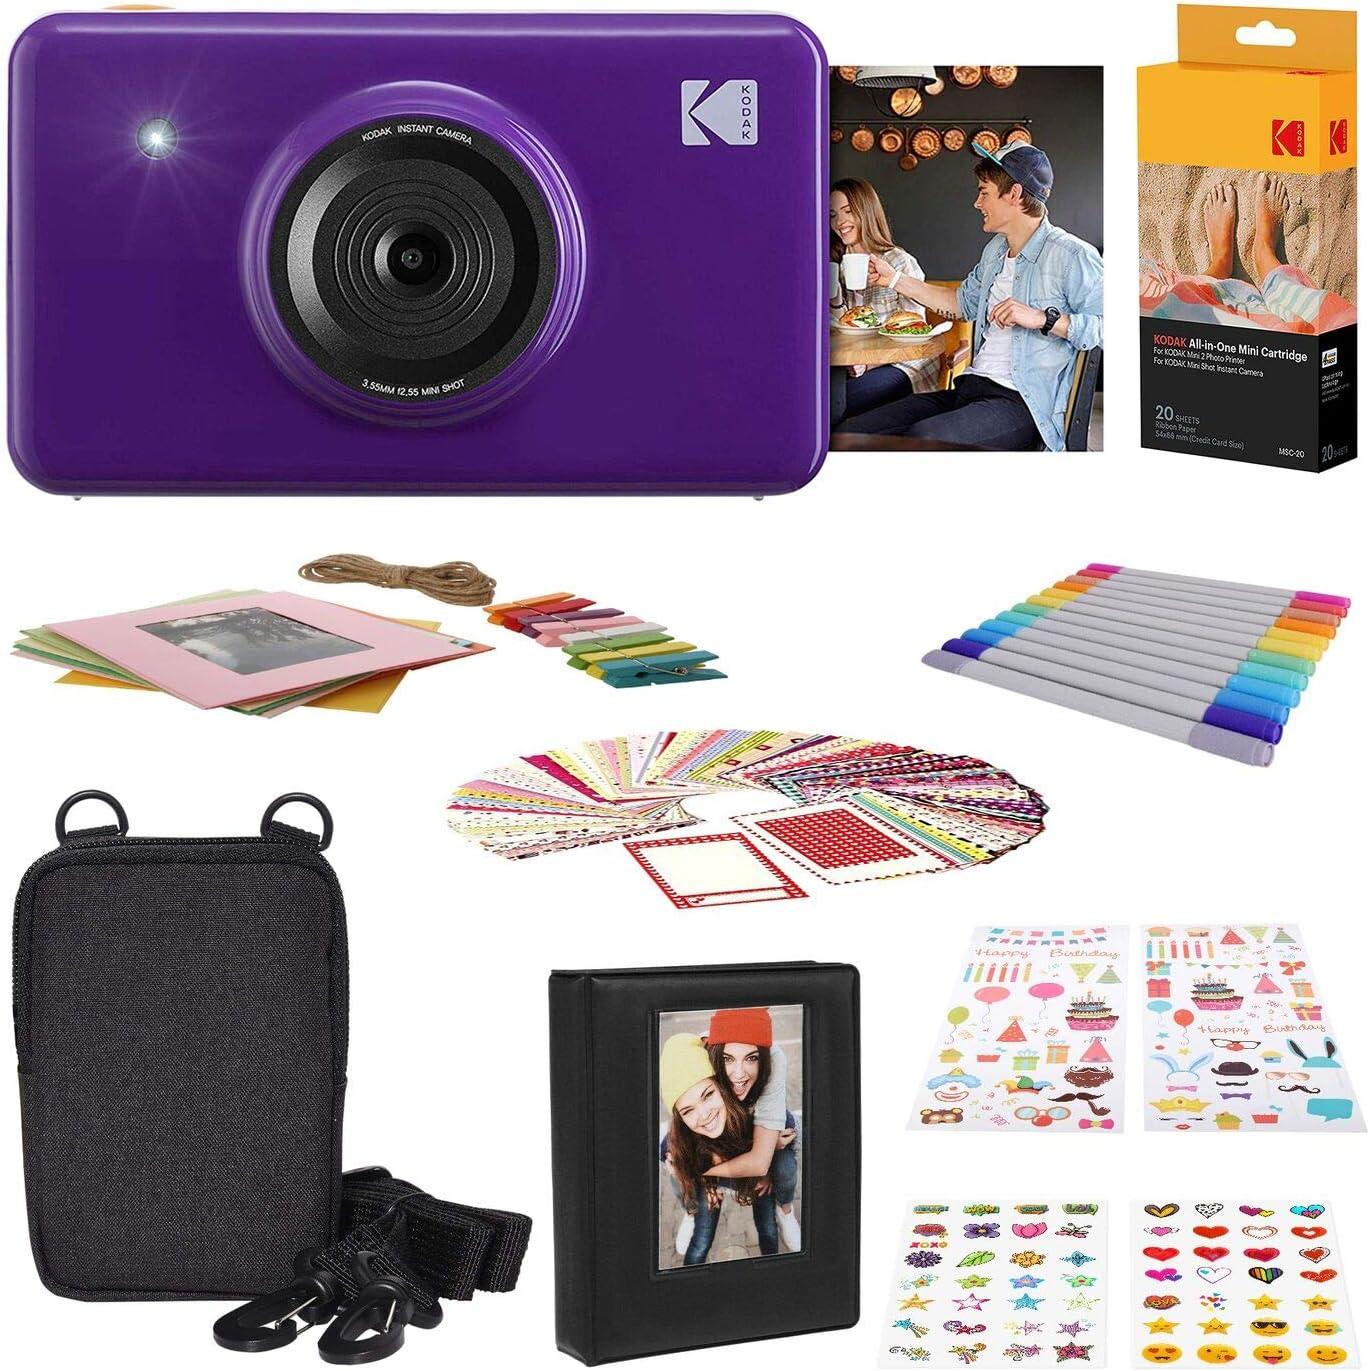 Kodak Mini Shot Wireless Sofortbild Digitalkamera Kamera